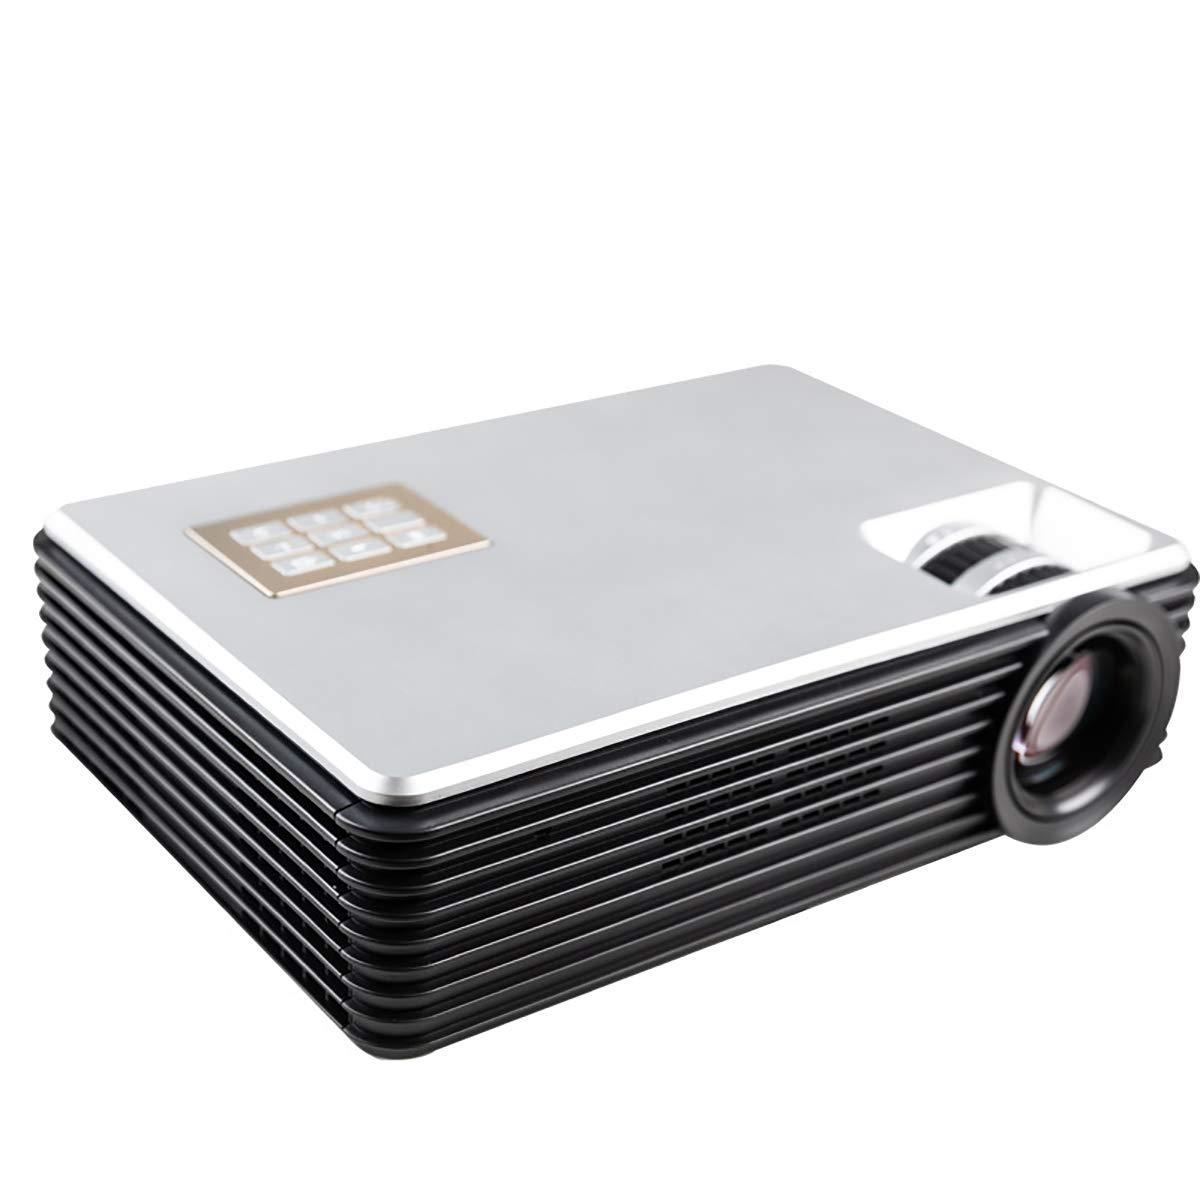 Ai LIFE Proyector 1080P Video proyector de 12000 lúmenes HD 1080P ...